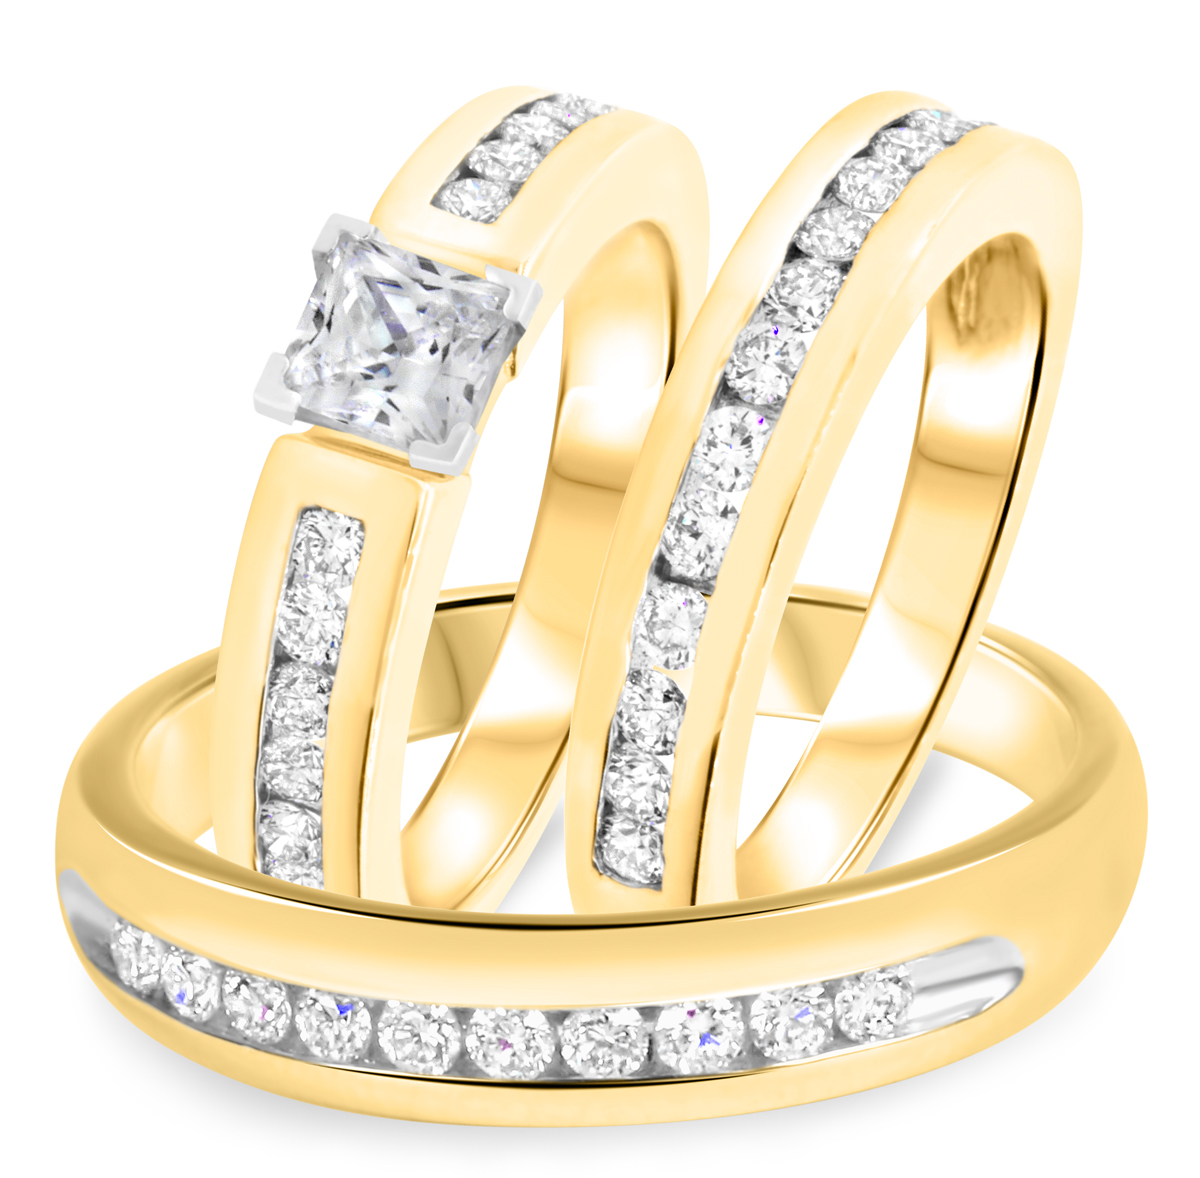 1 7/8 CT. T.W. Diamond Ladies Engagement Ring, Wedding Band, Men's Wedding Band